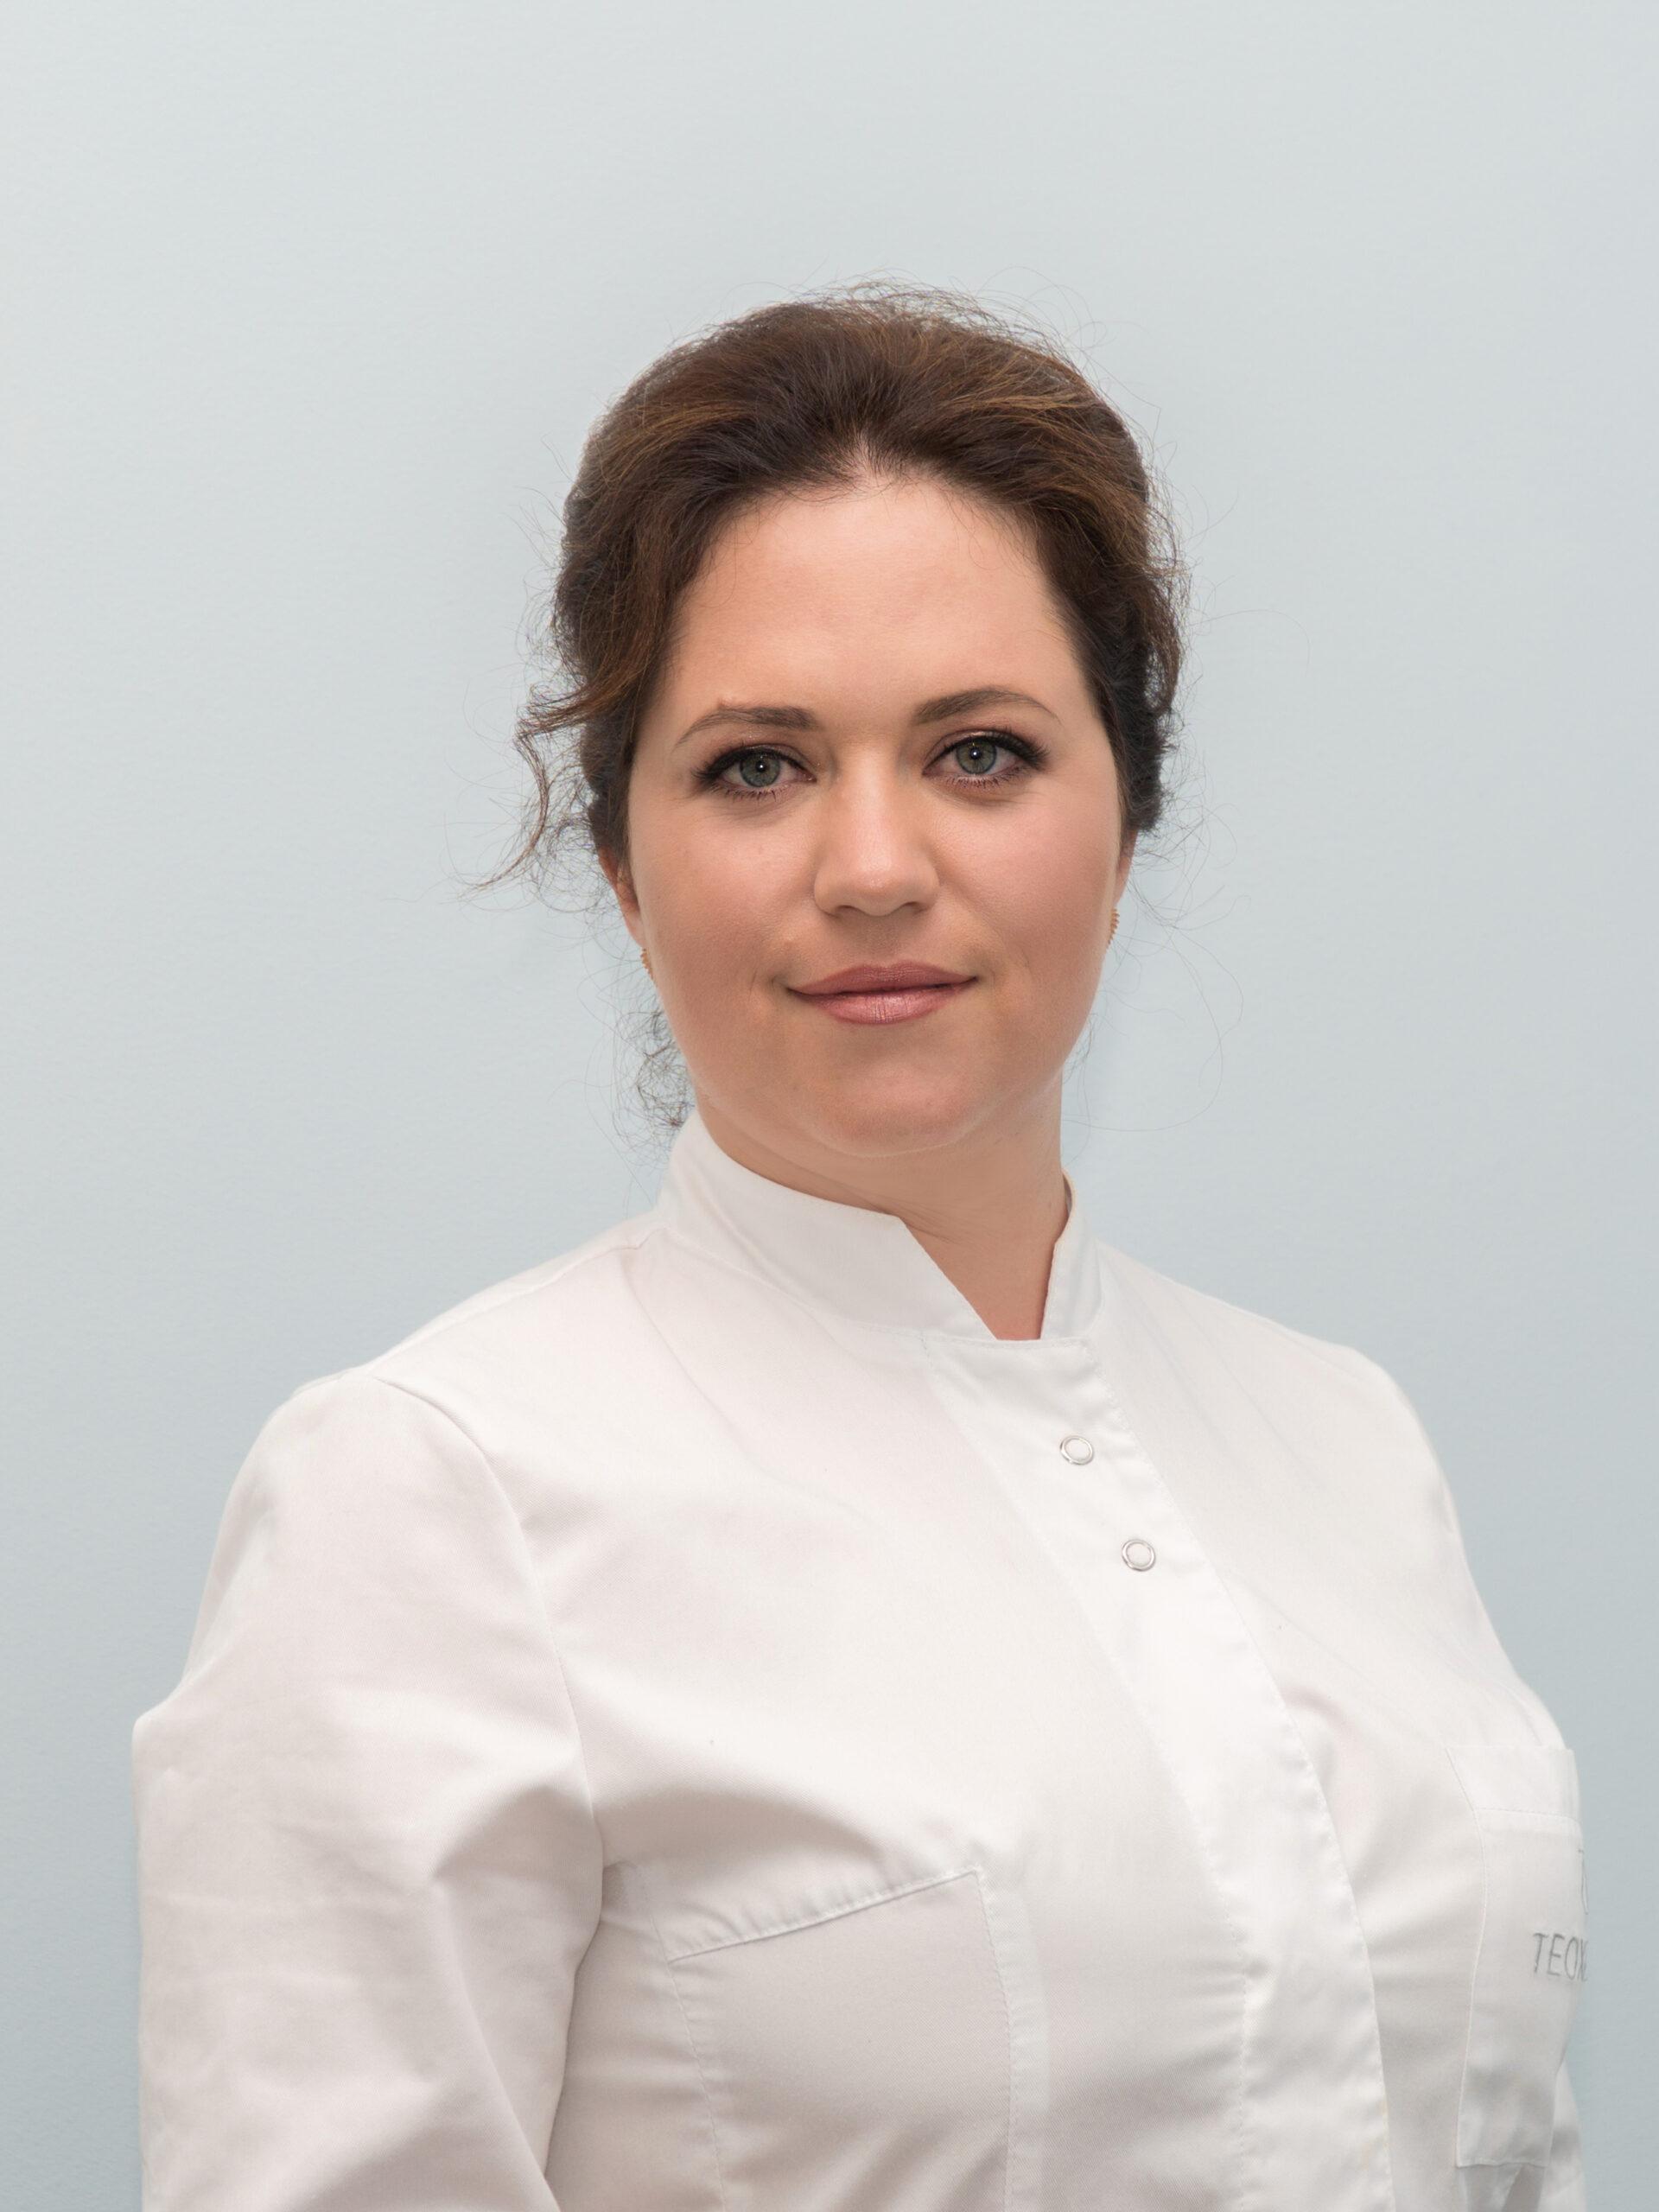 Безпалько Людмила Юріївна